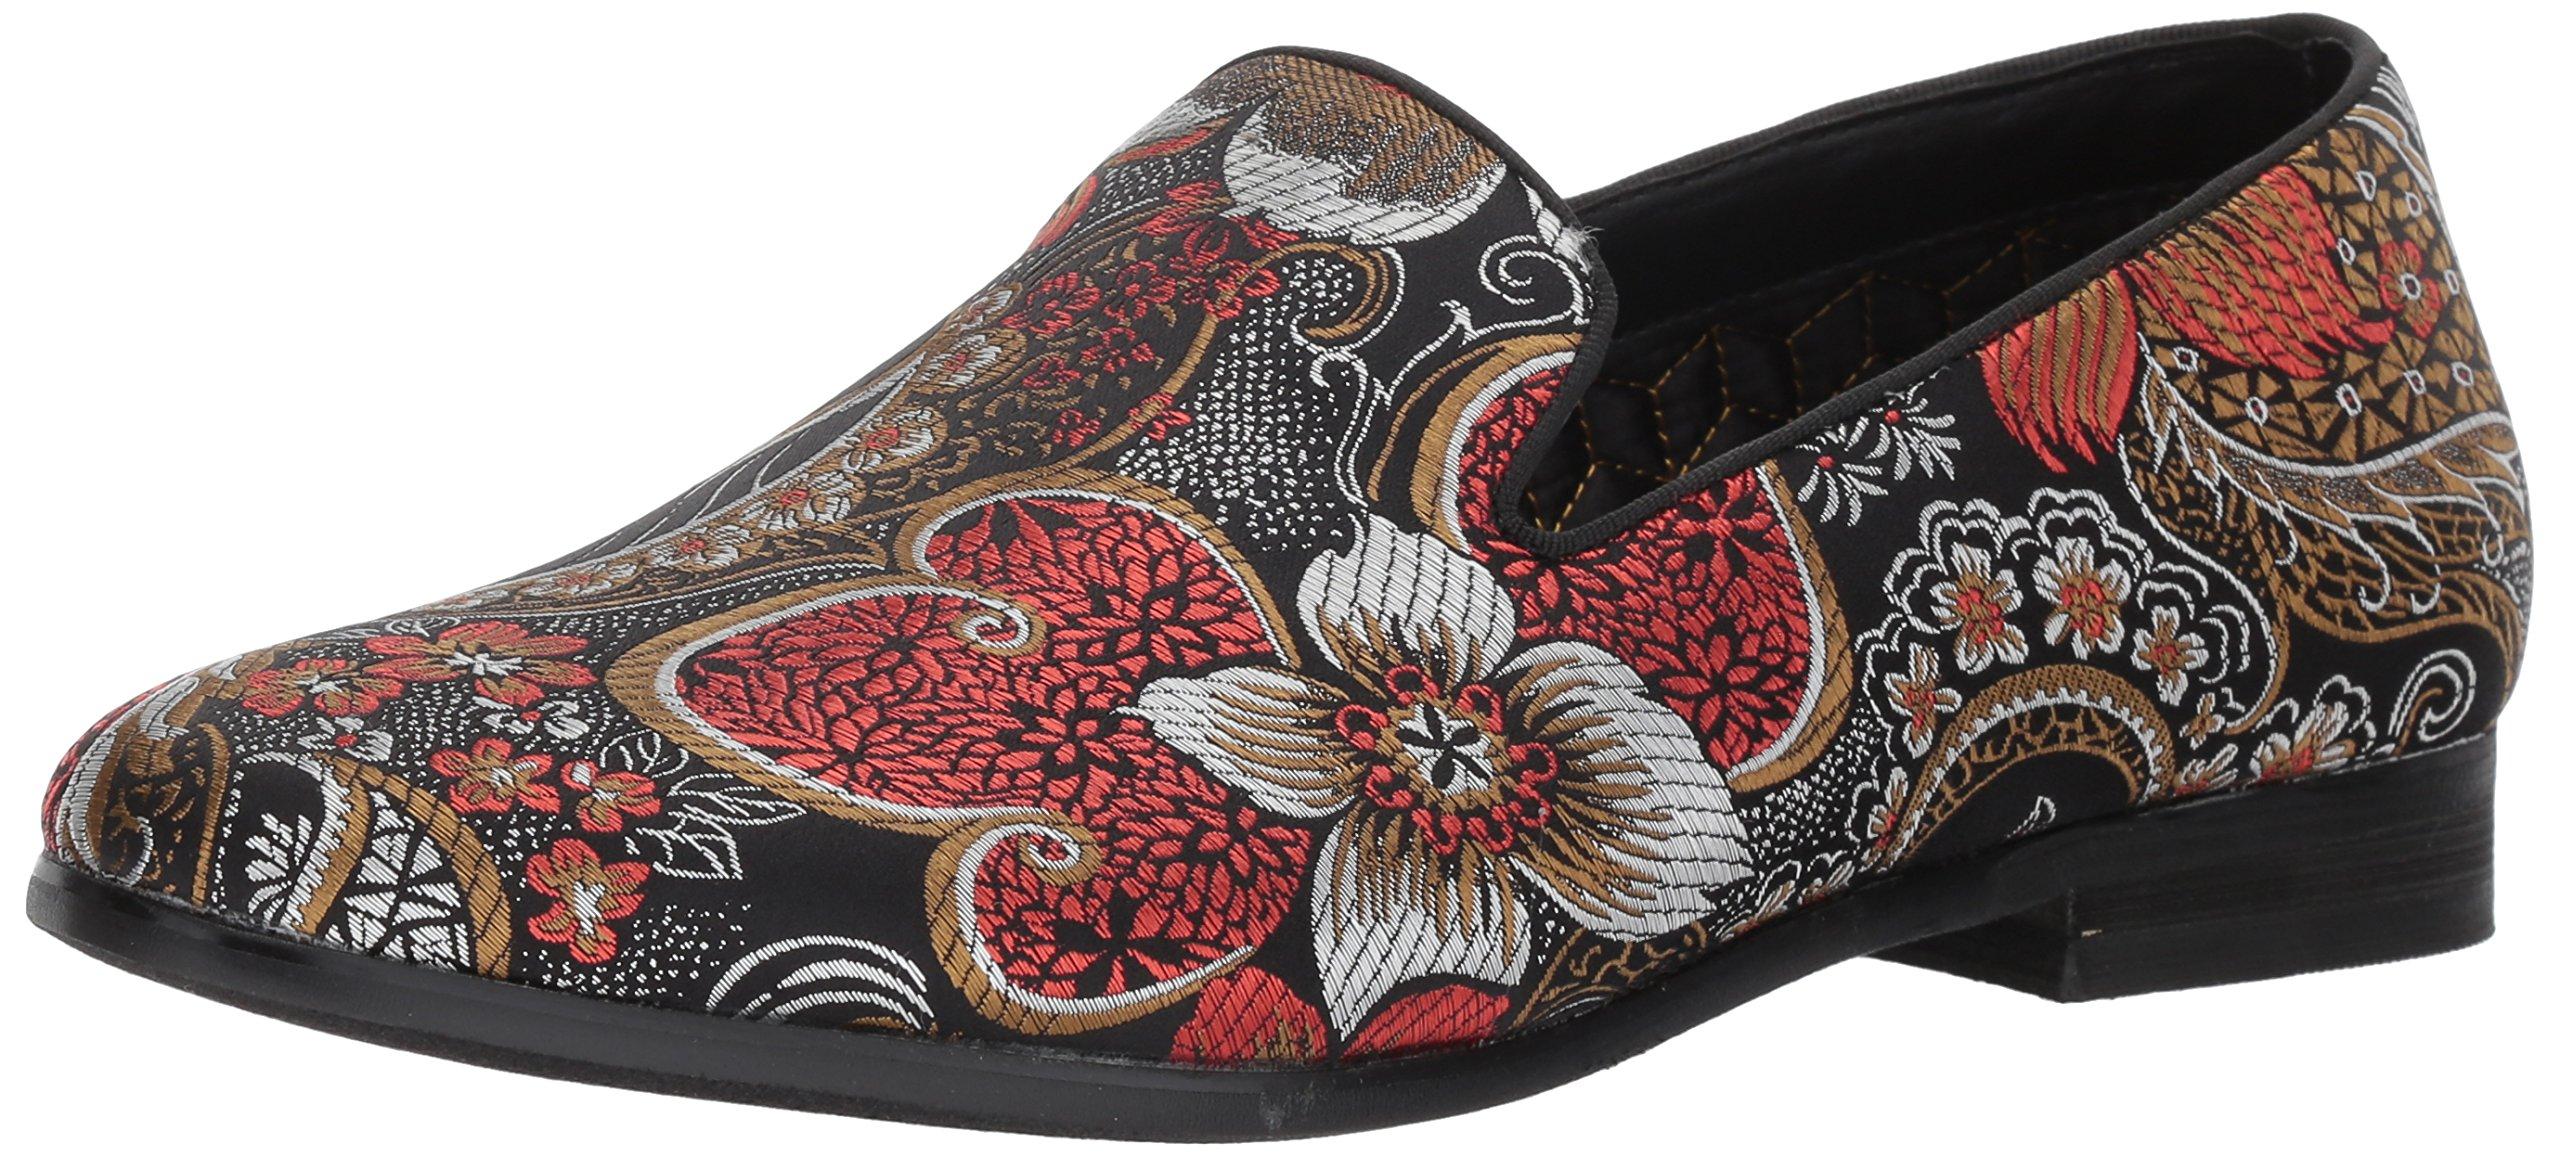 Steve Madden Men's Cypress Loafer, Red/Multi, 13 M US